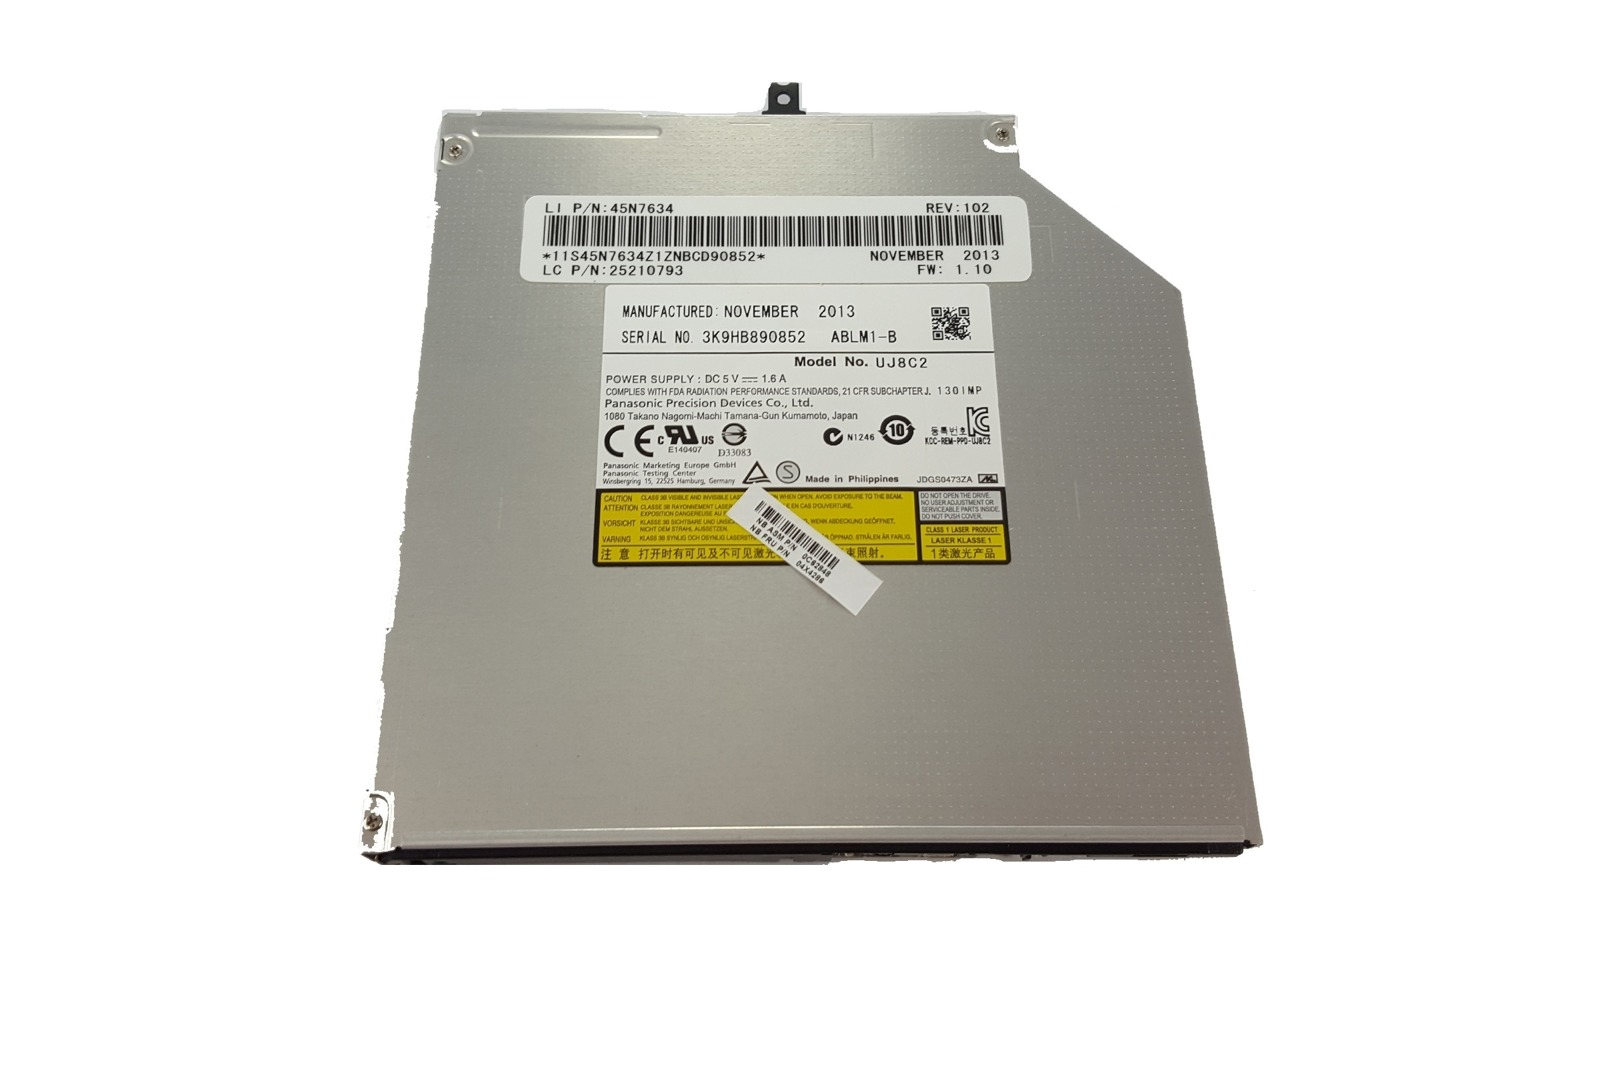 Laufwerk DVD-RW Panasonic UJ8B2 UJ8C2 Für Dell ASUS HP